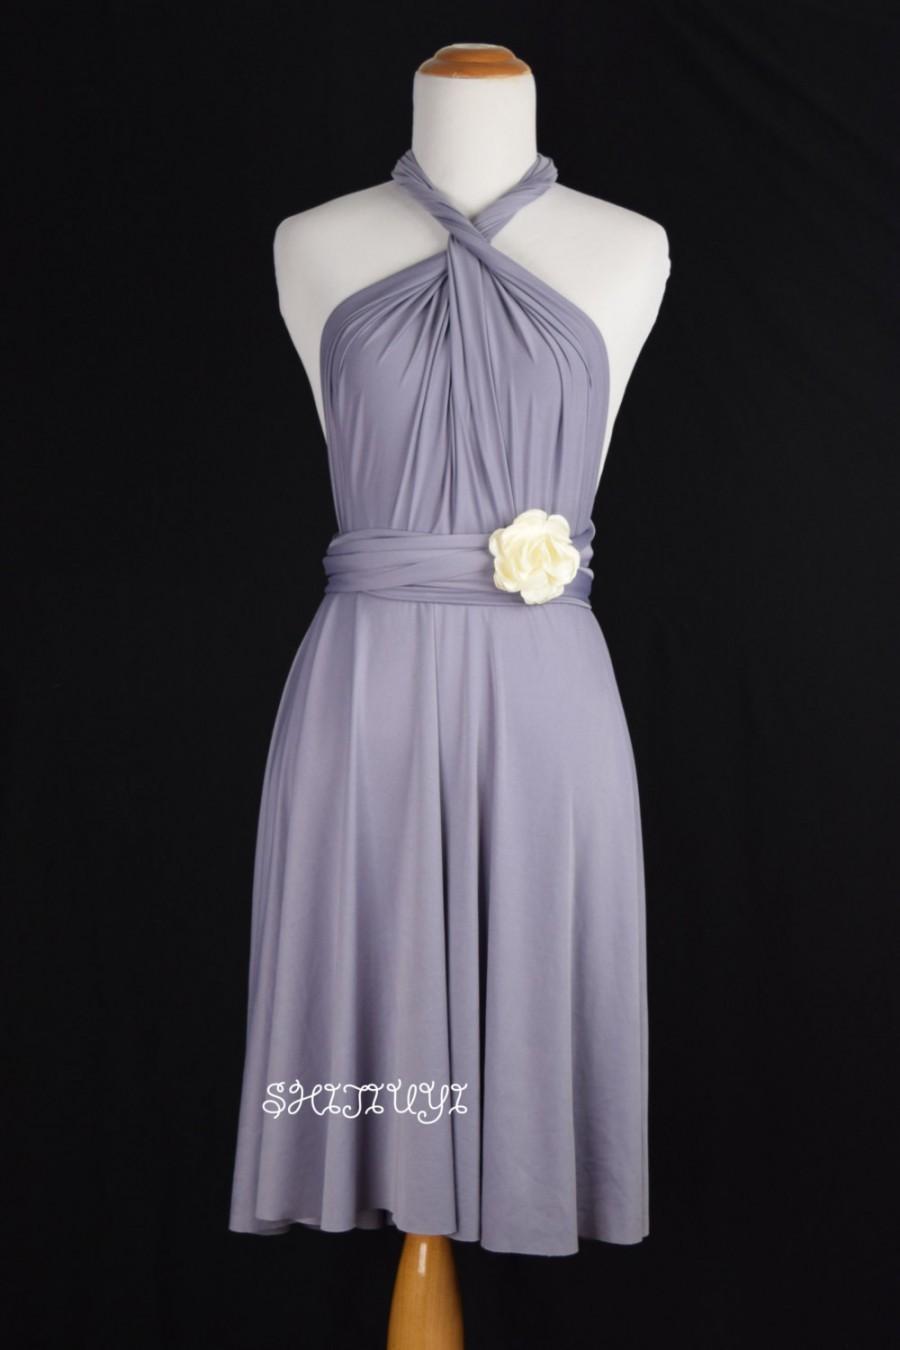 Wedding - Bridesmaid Dress Lilac Grey Infinity Dress  Knee Length Wrap Convertible Dress S119